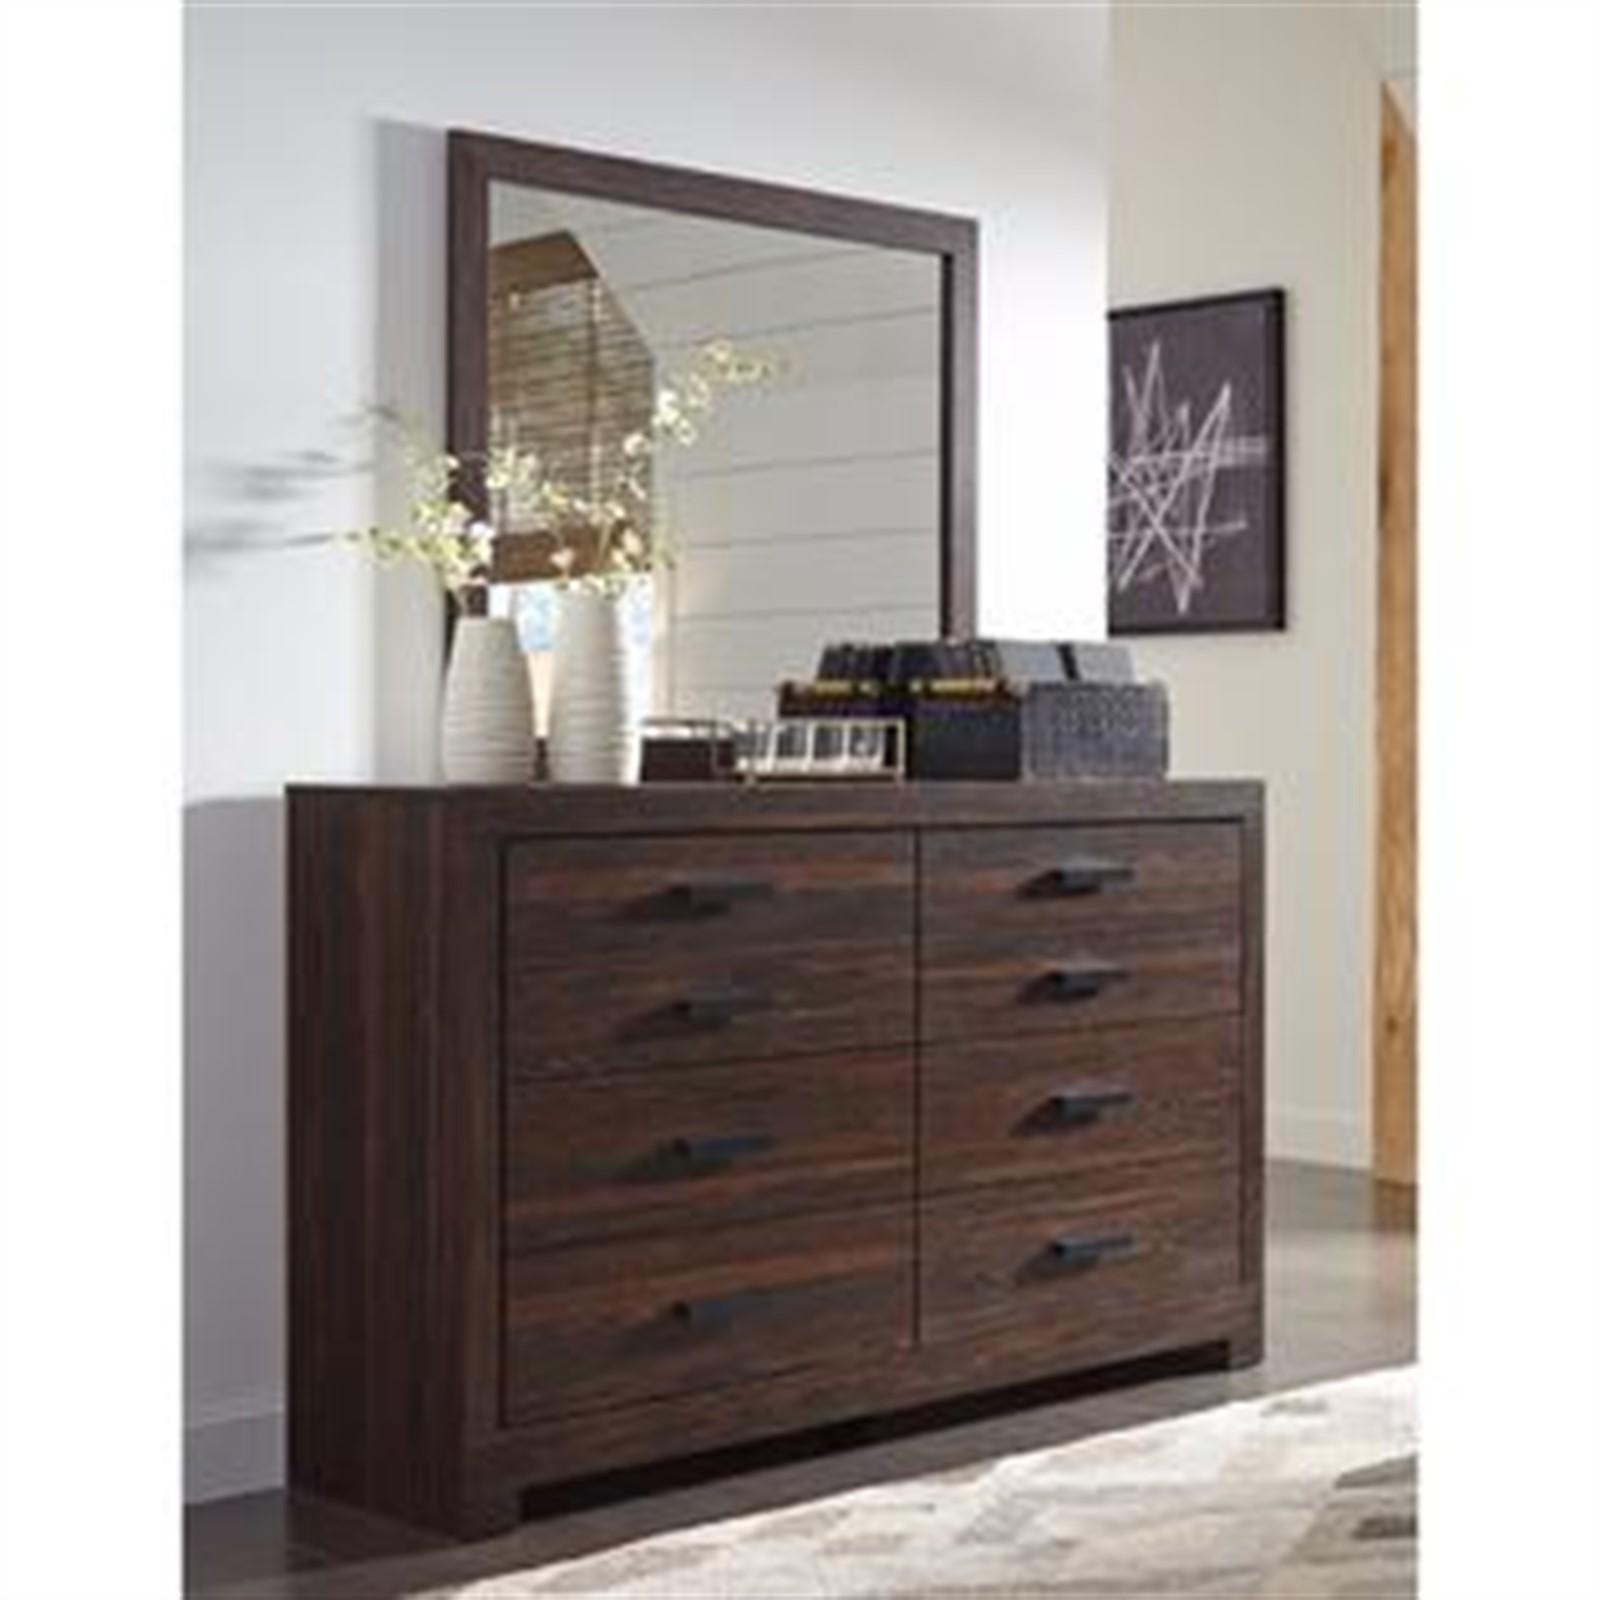 Arkaline Dresser and Mirror Set - Brown